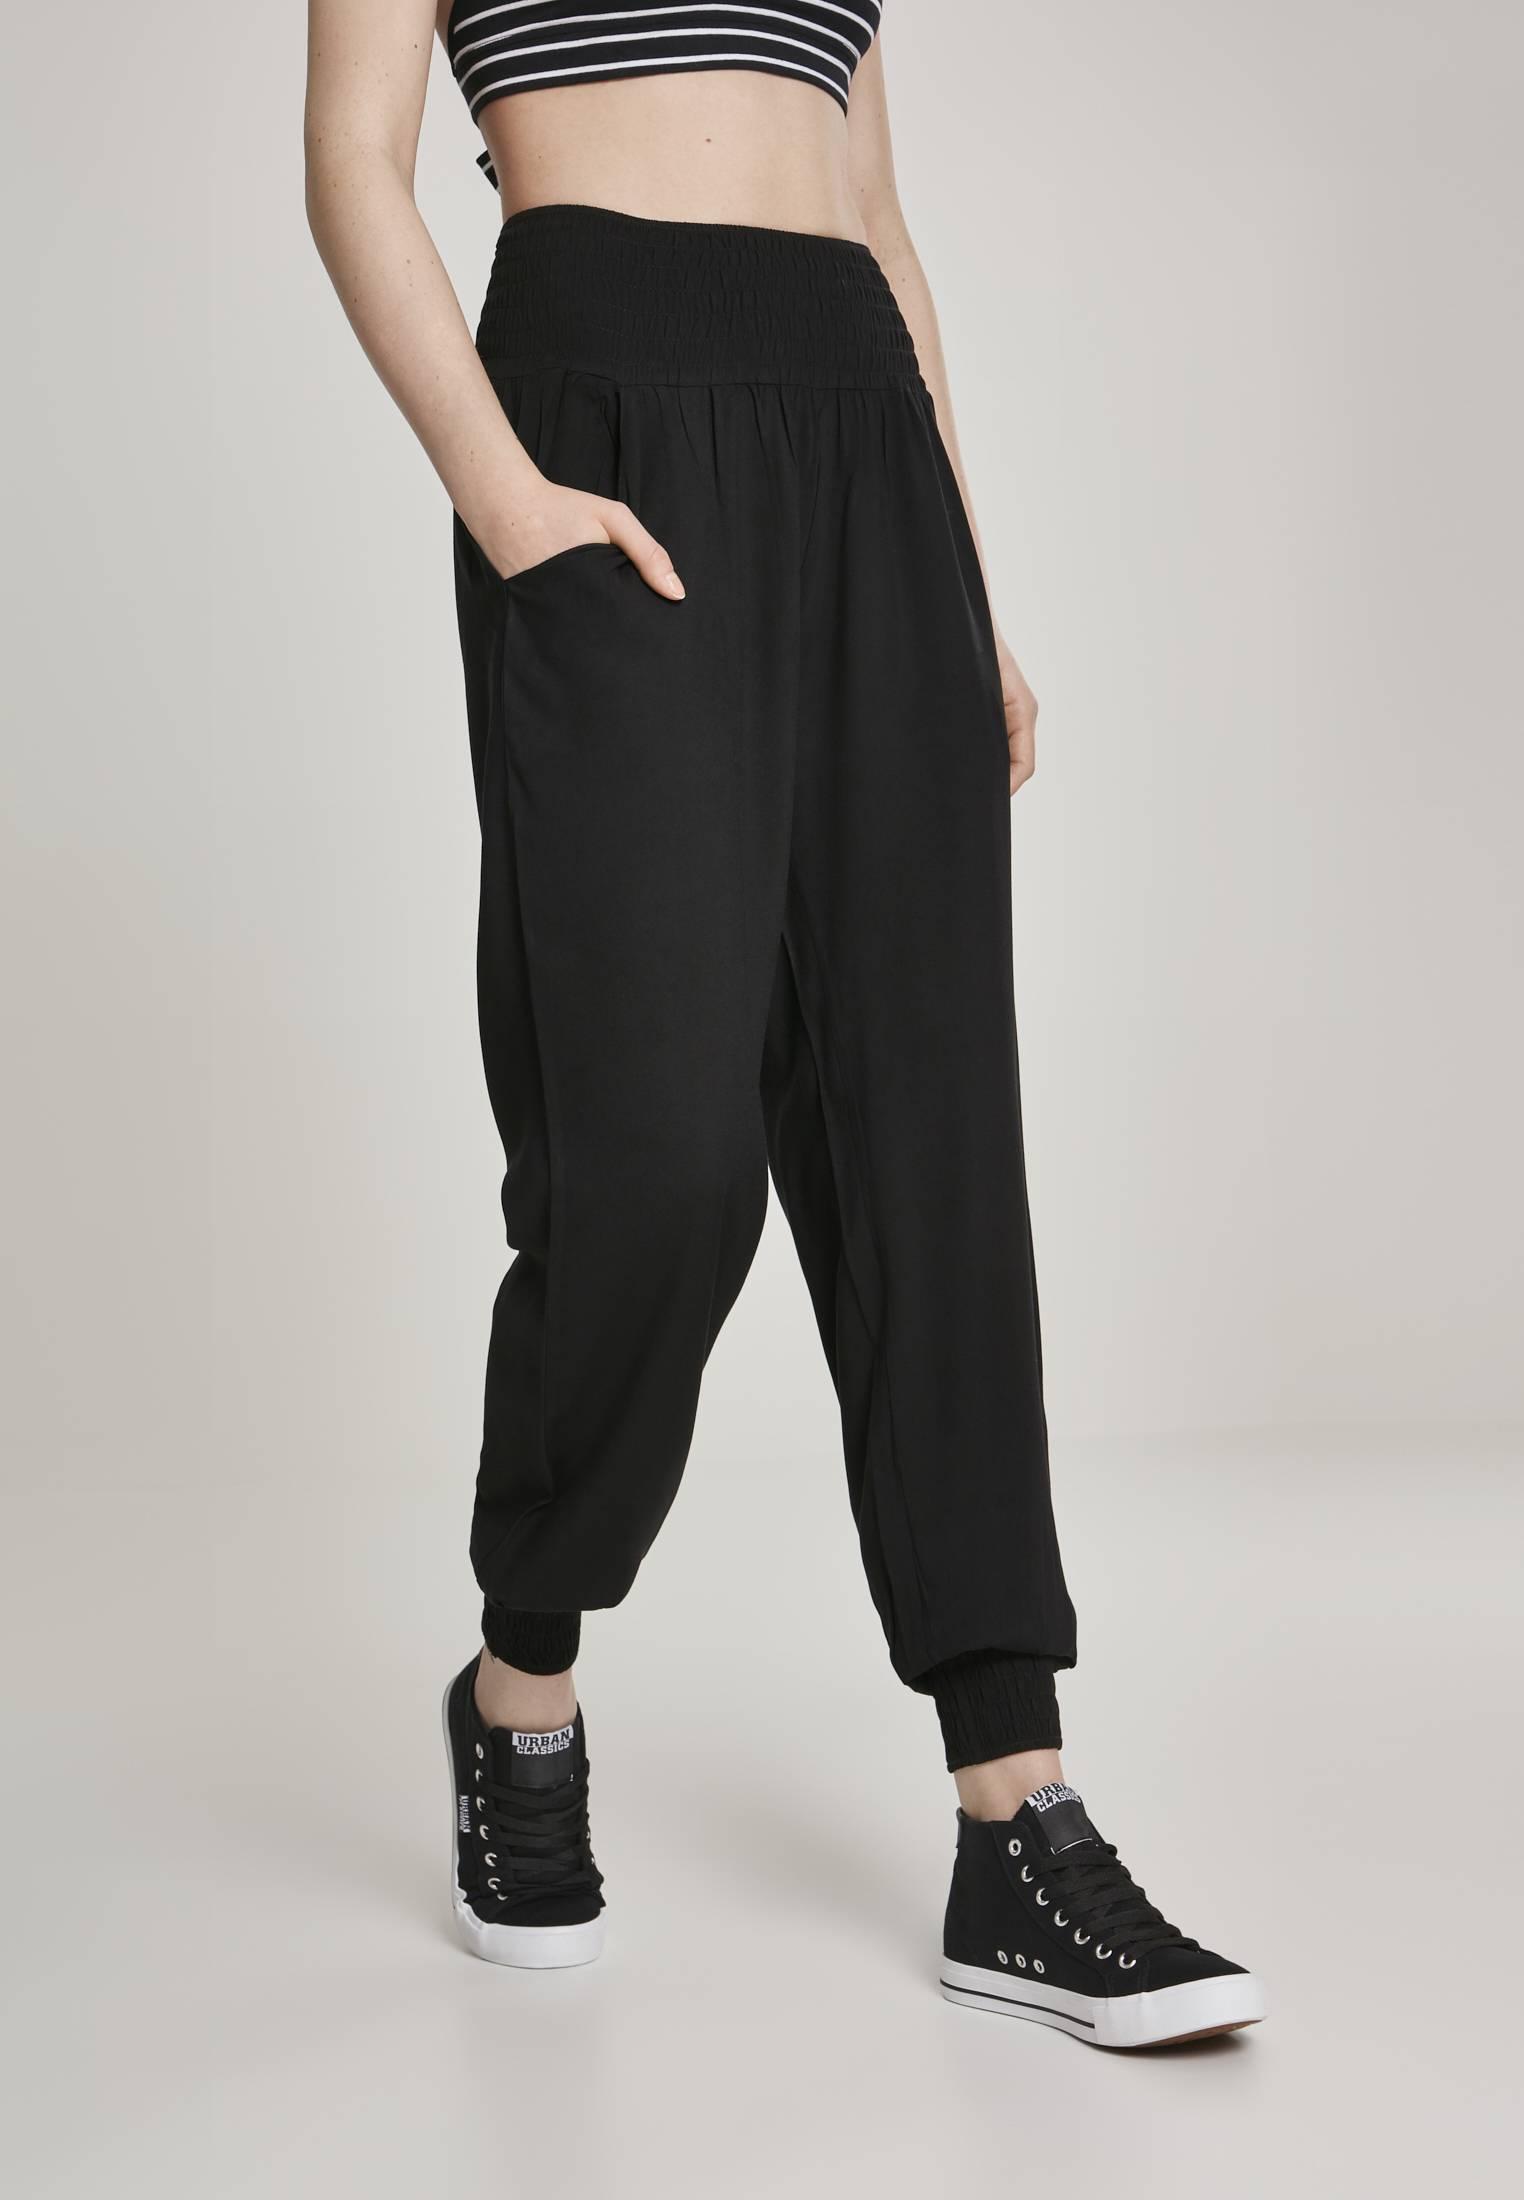 Urban Classics Ladies Sarong Pants black - 4XL